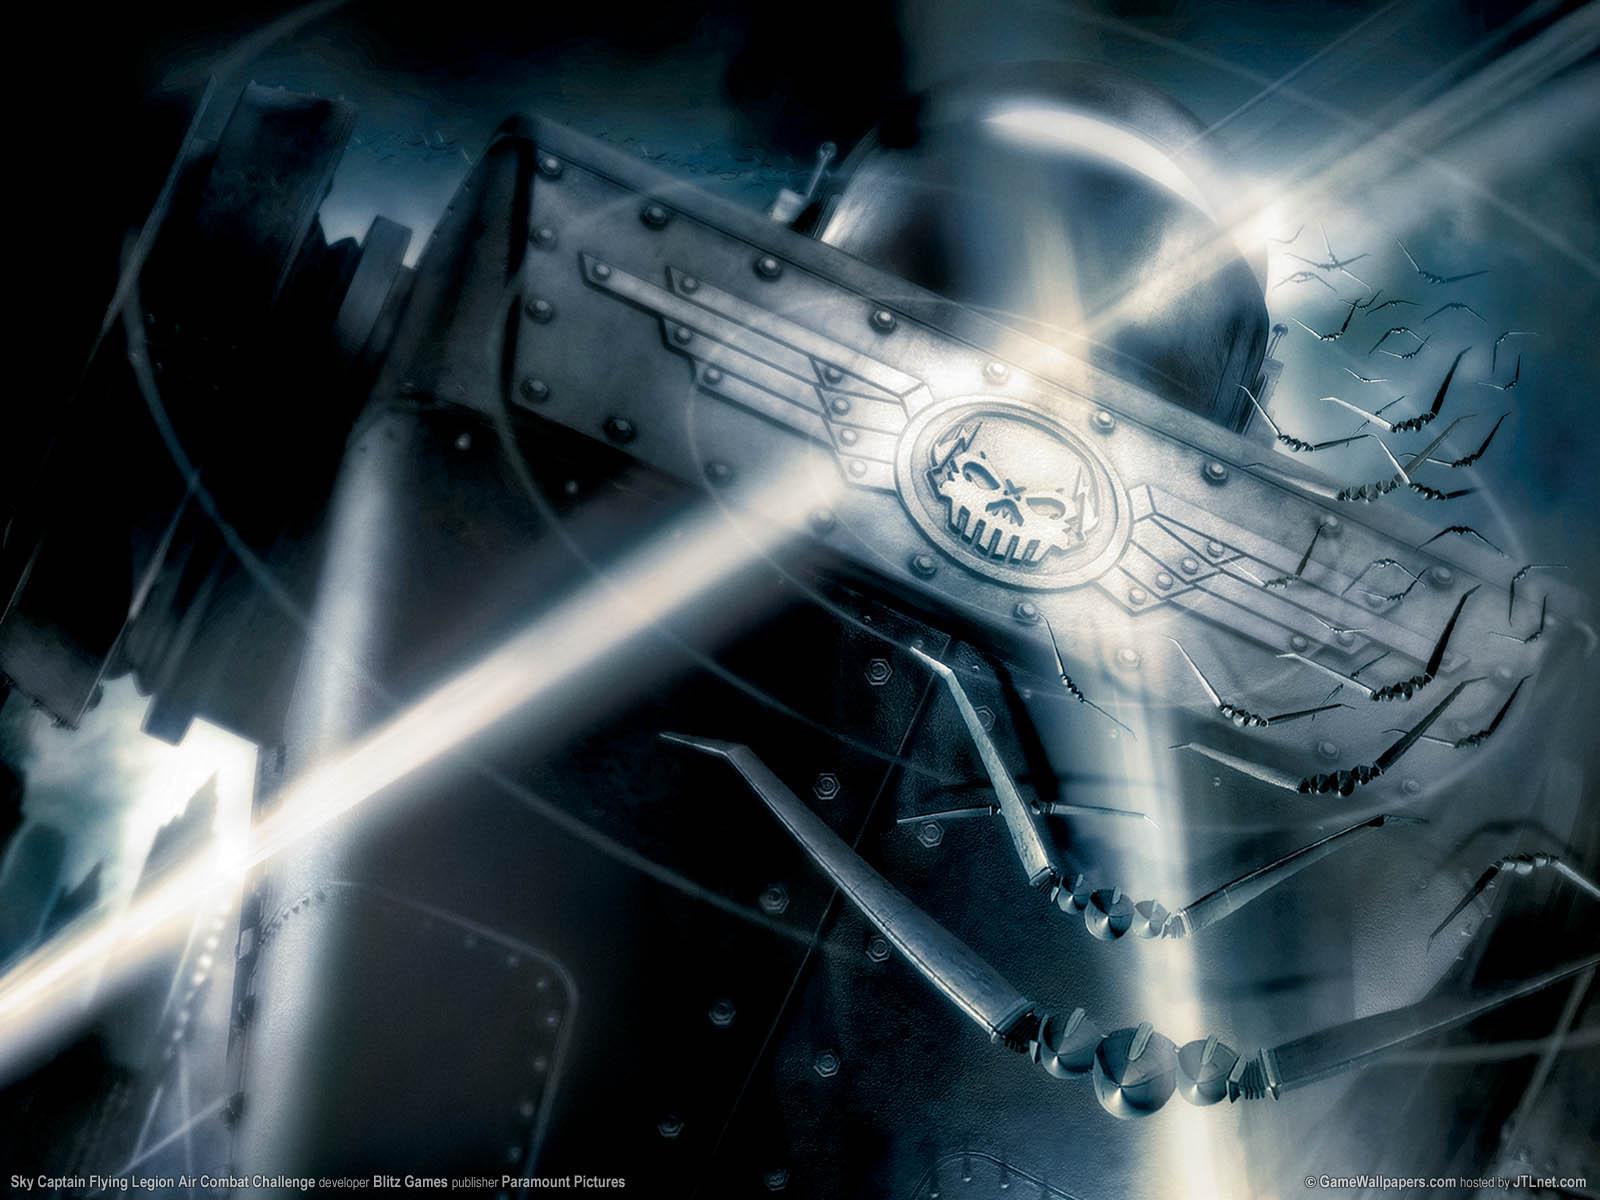 Sky Captain: Flying Legion Air Combat Challenge Hintergrundbild 01 1600x1200